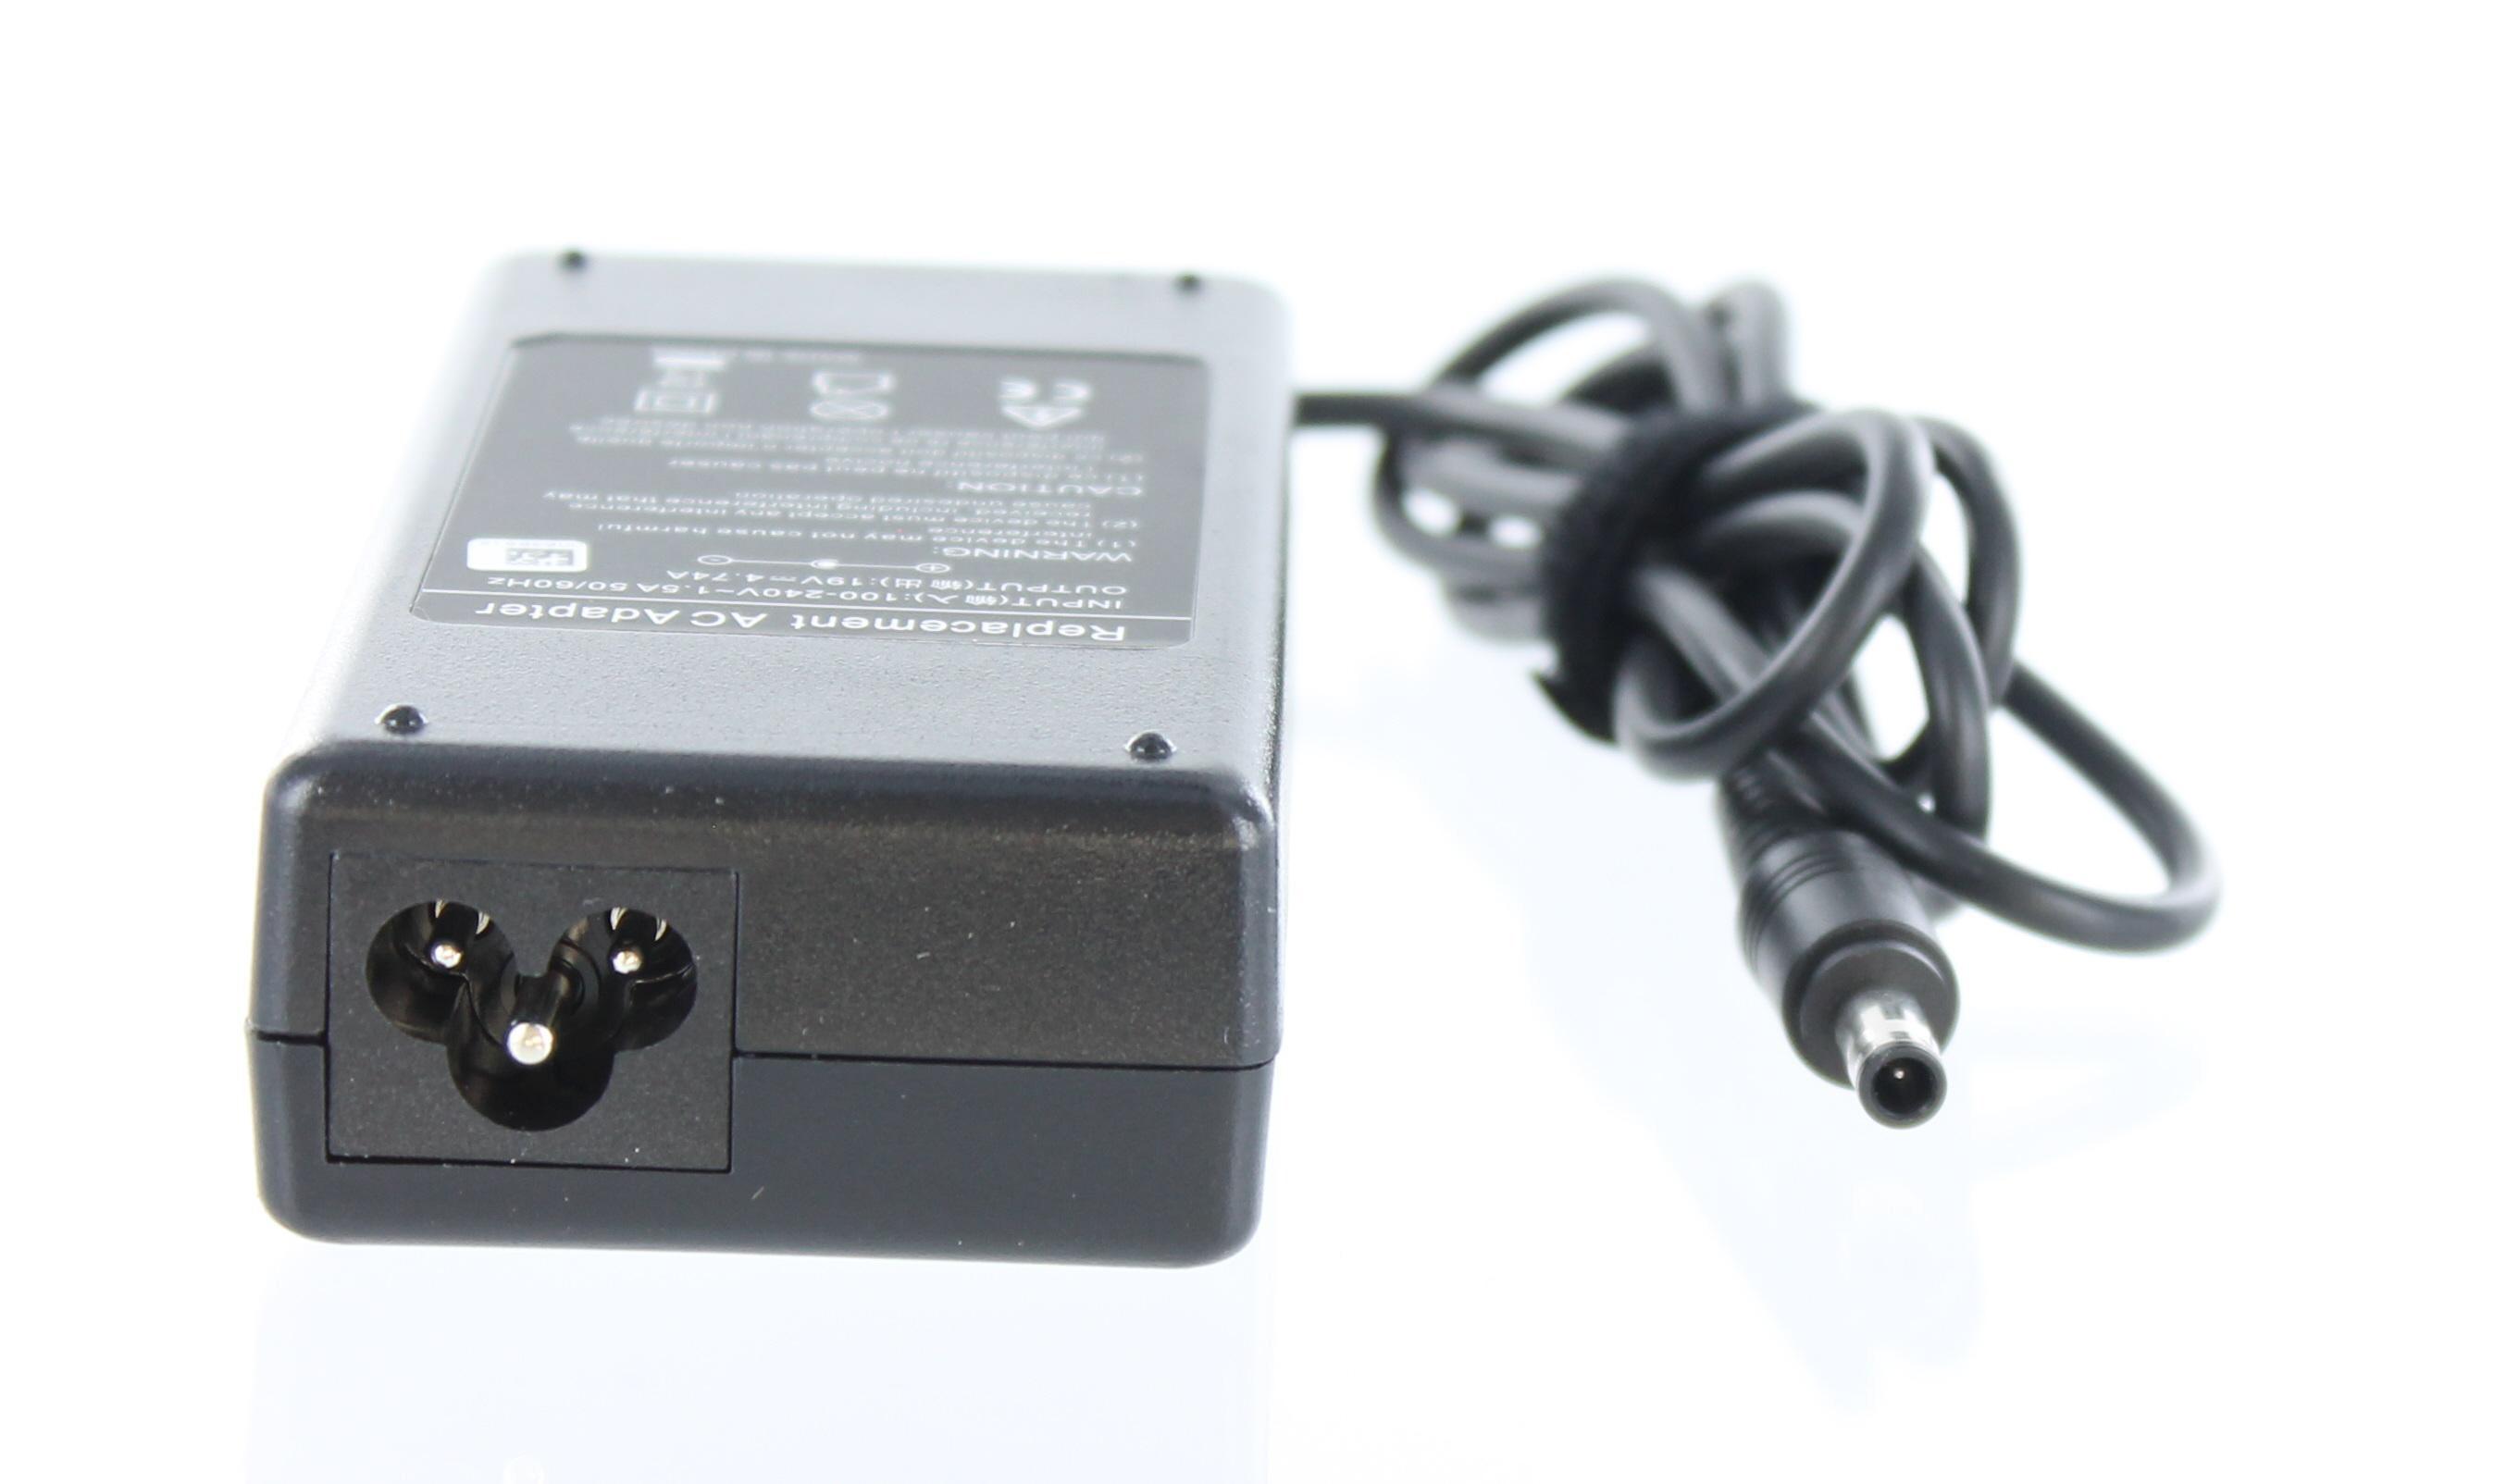 I Netzteil kompatibel mit SAMSUNG NP-R710-AS08DE kompatiblen